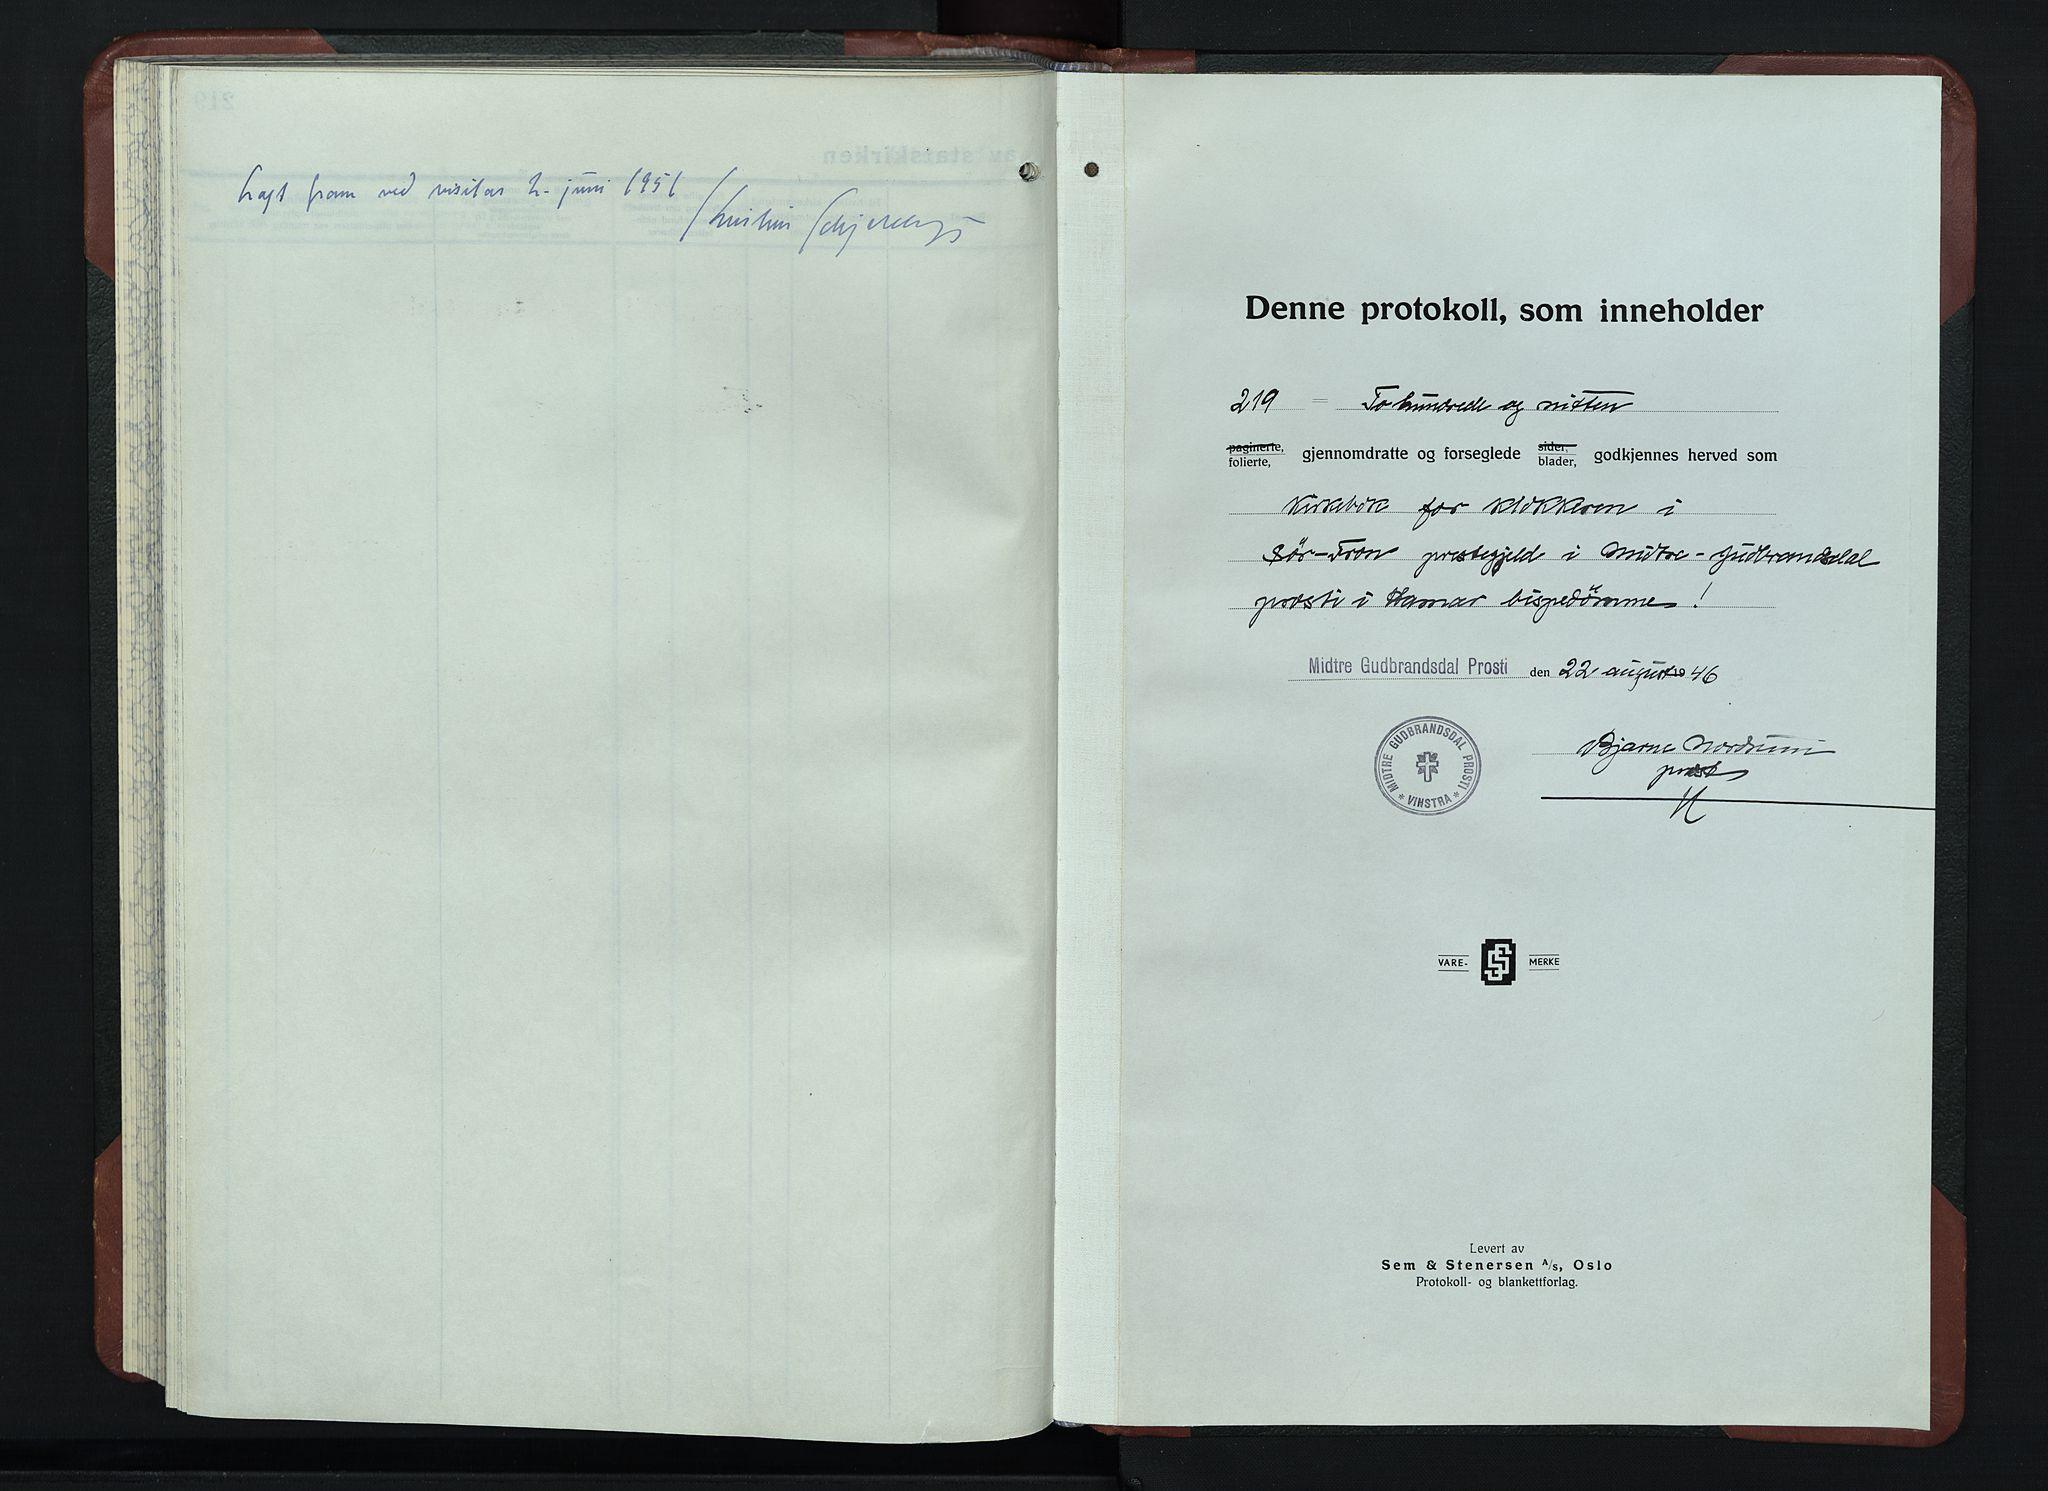 SAH, Sør-Fron prestekontor, H/Ha/Hab/L0006: Klokkerbok nr. 6, 1933-1948